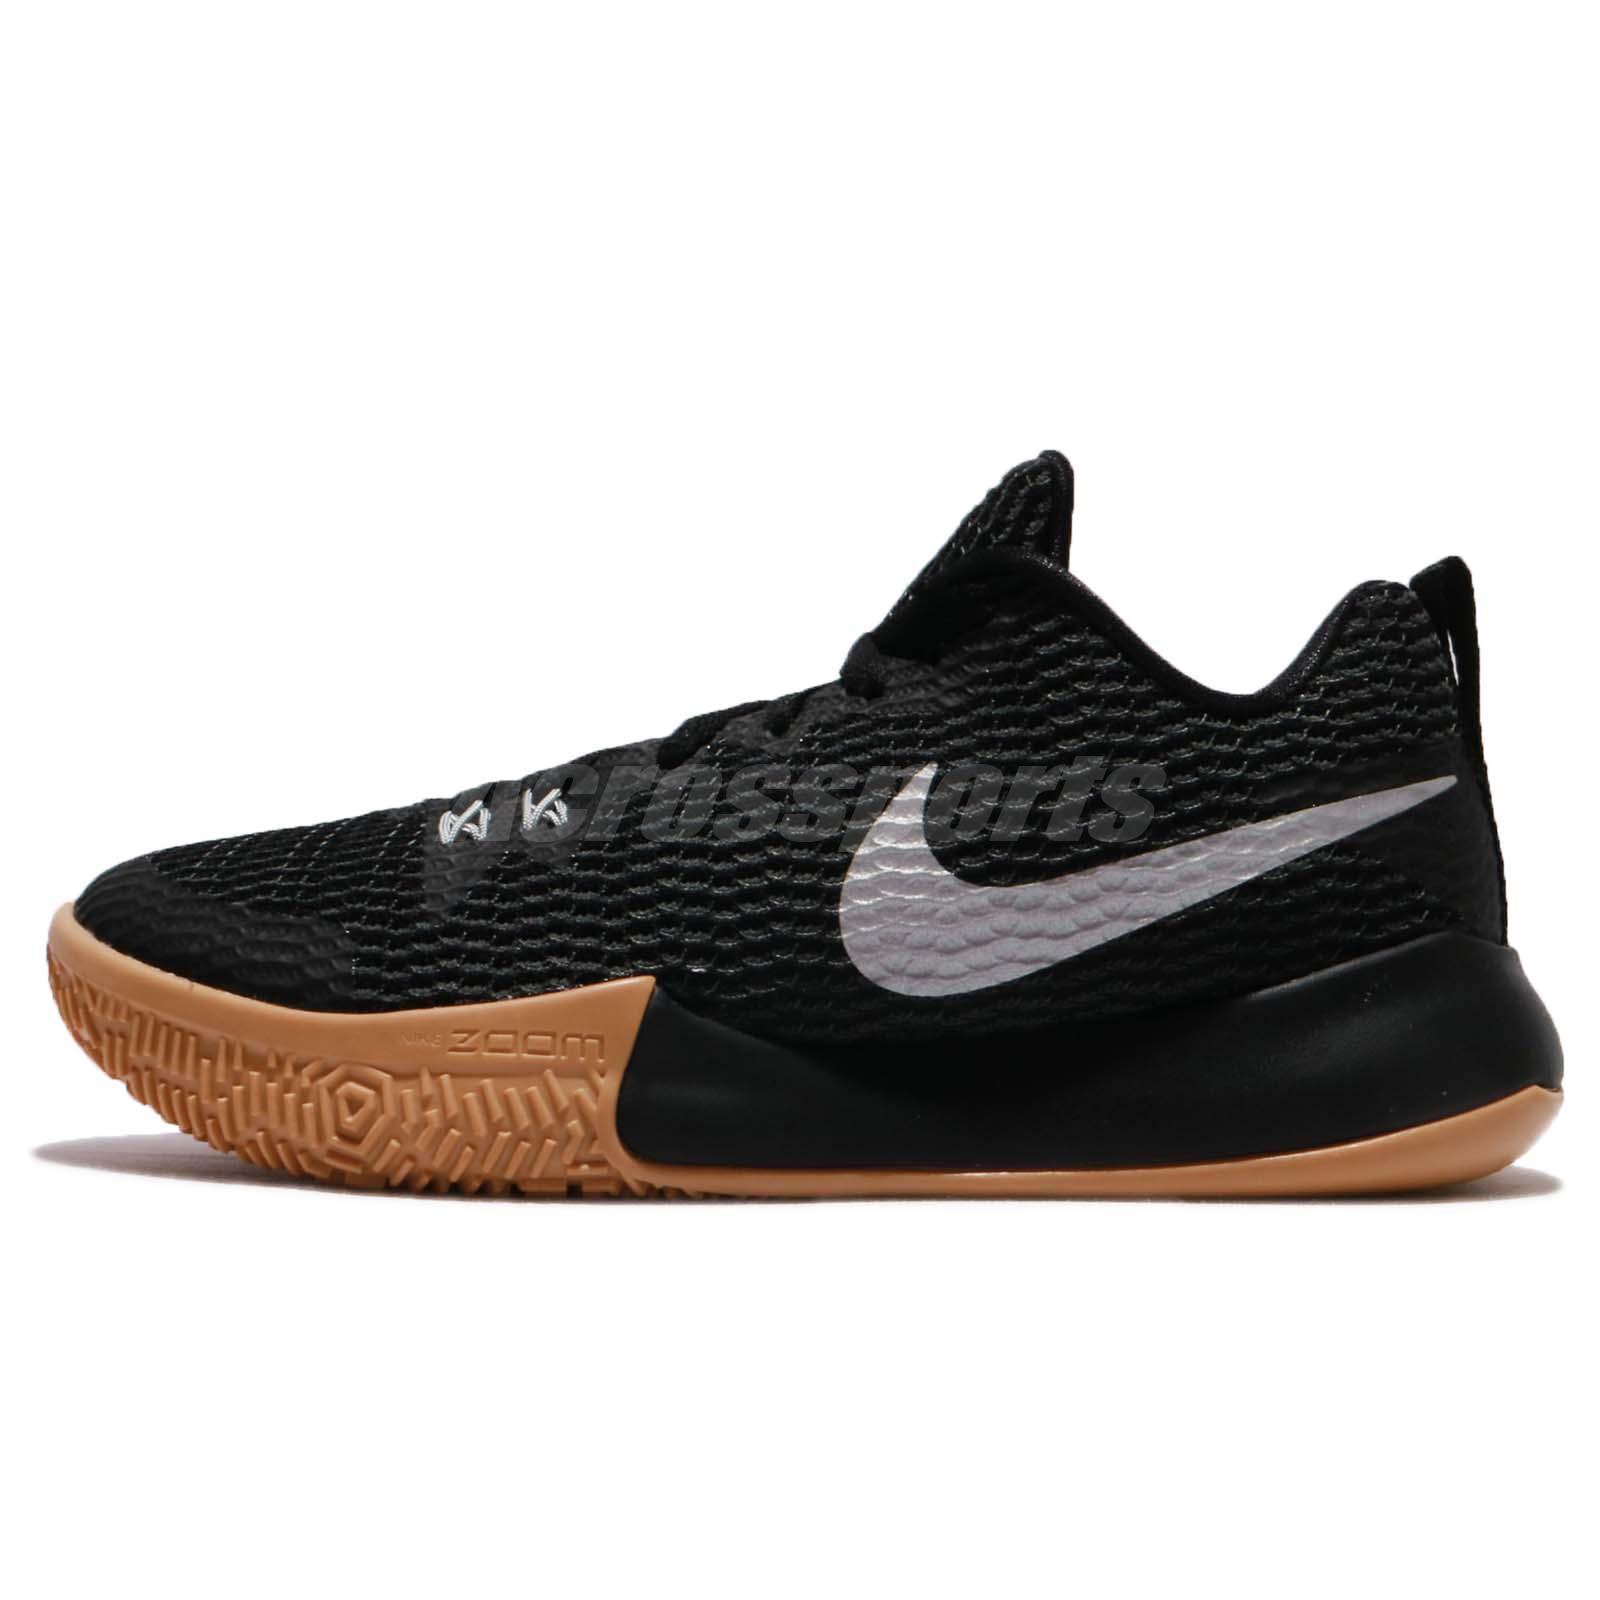 17ae6cdb263e Wmns Nike Zoom Live II EP Black Reflect Silver Gum Women Basketball  AH7579-001